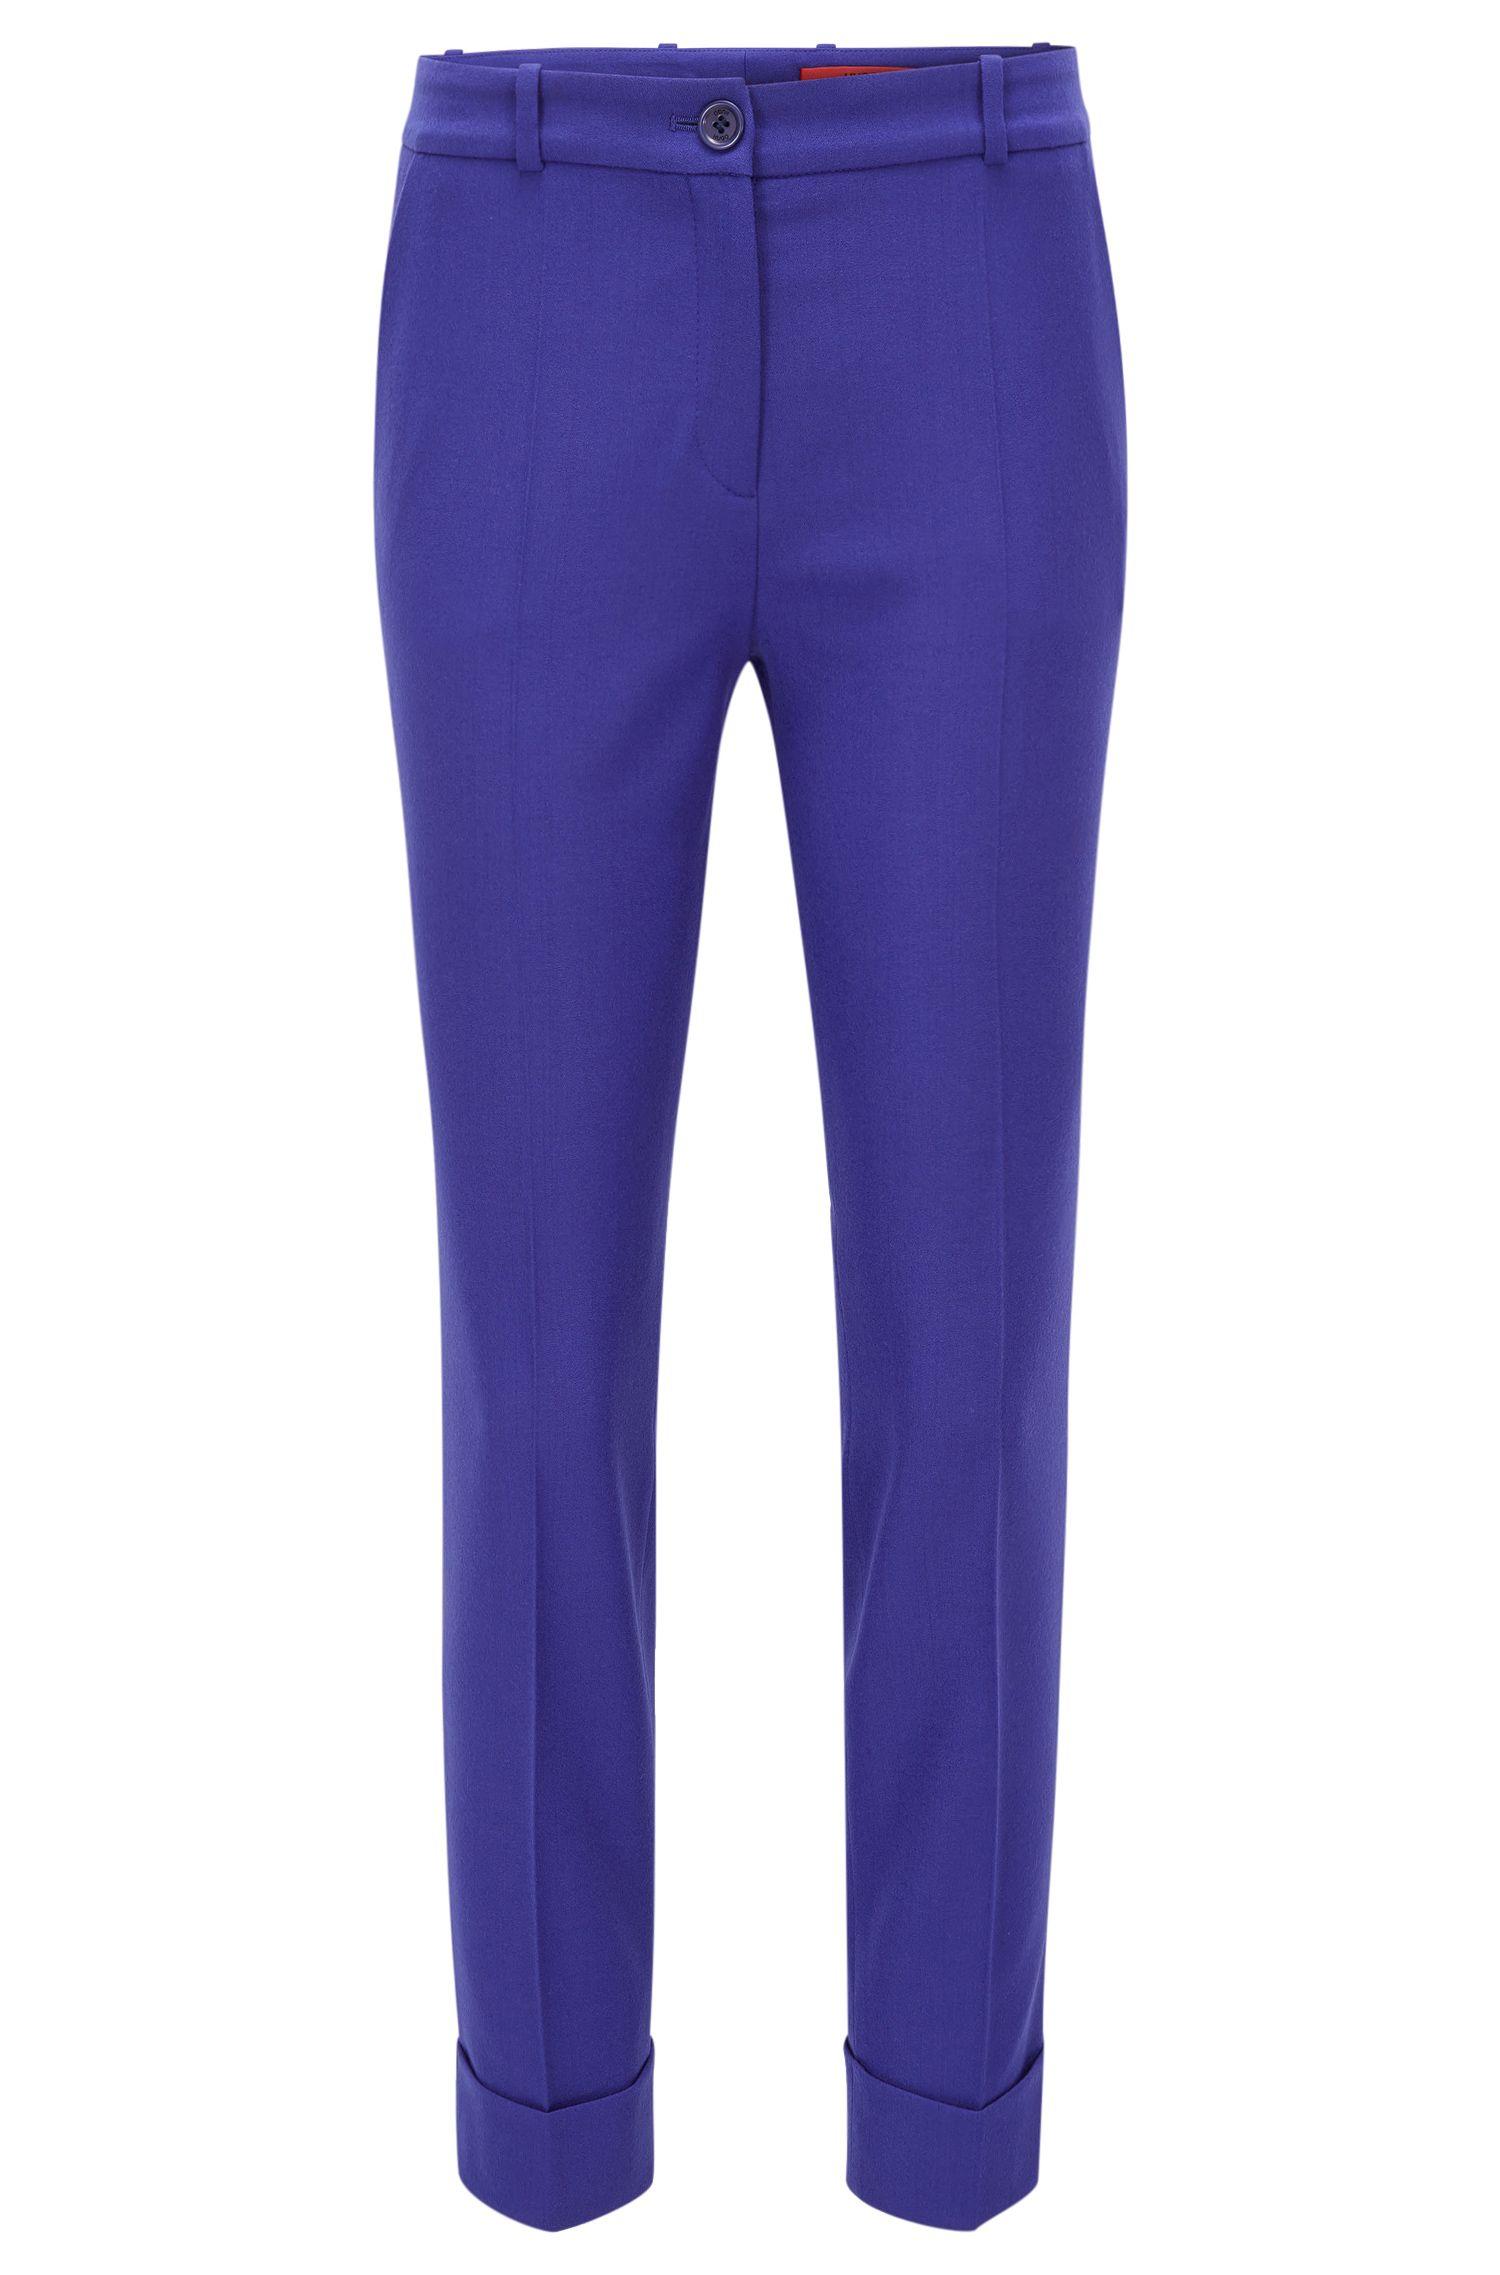 Slim-fit, cropped broek van een wolmix